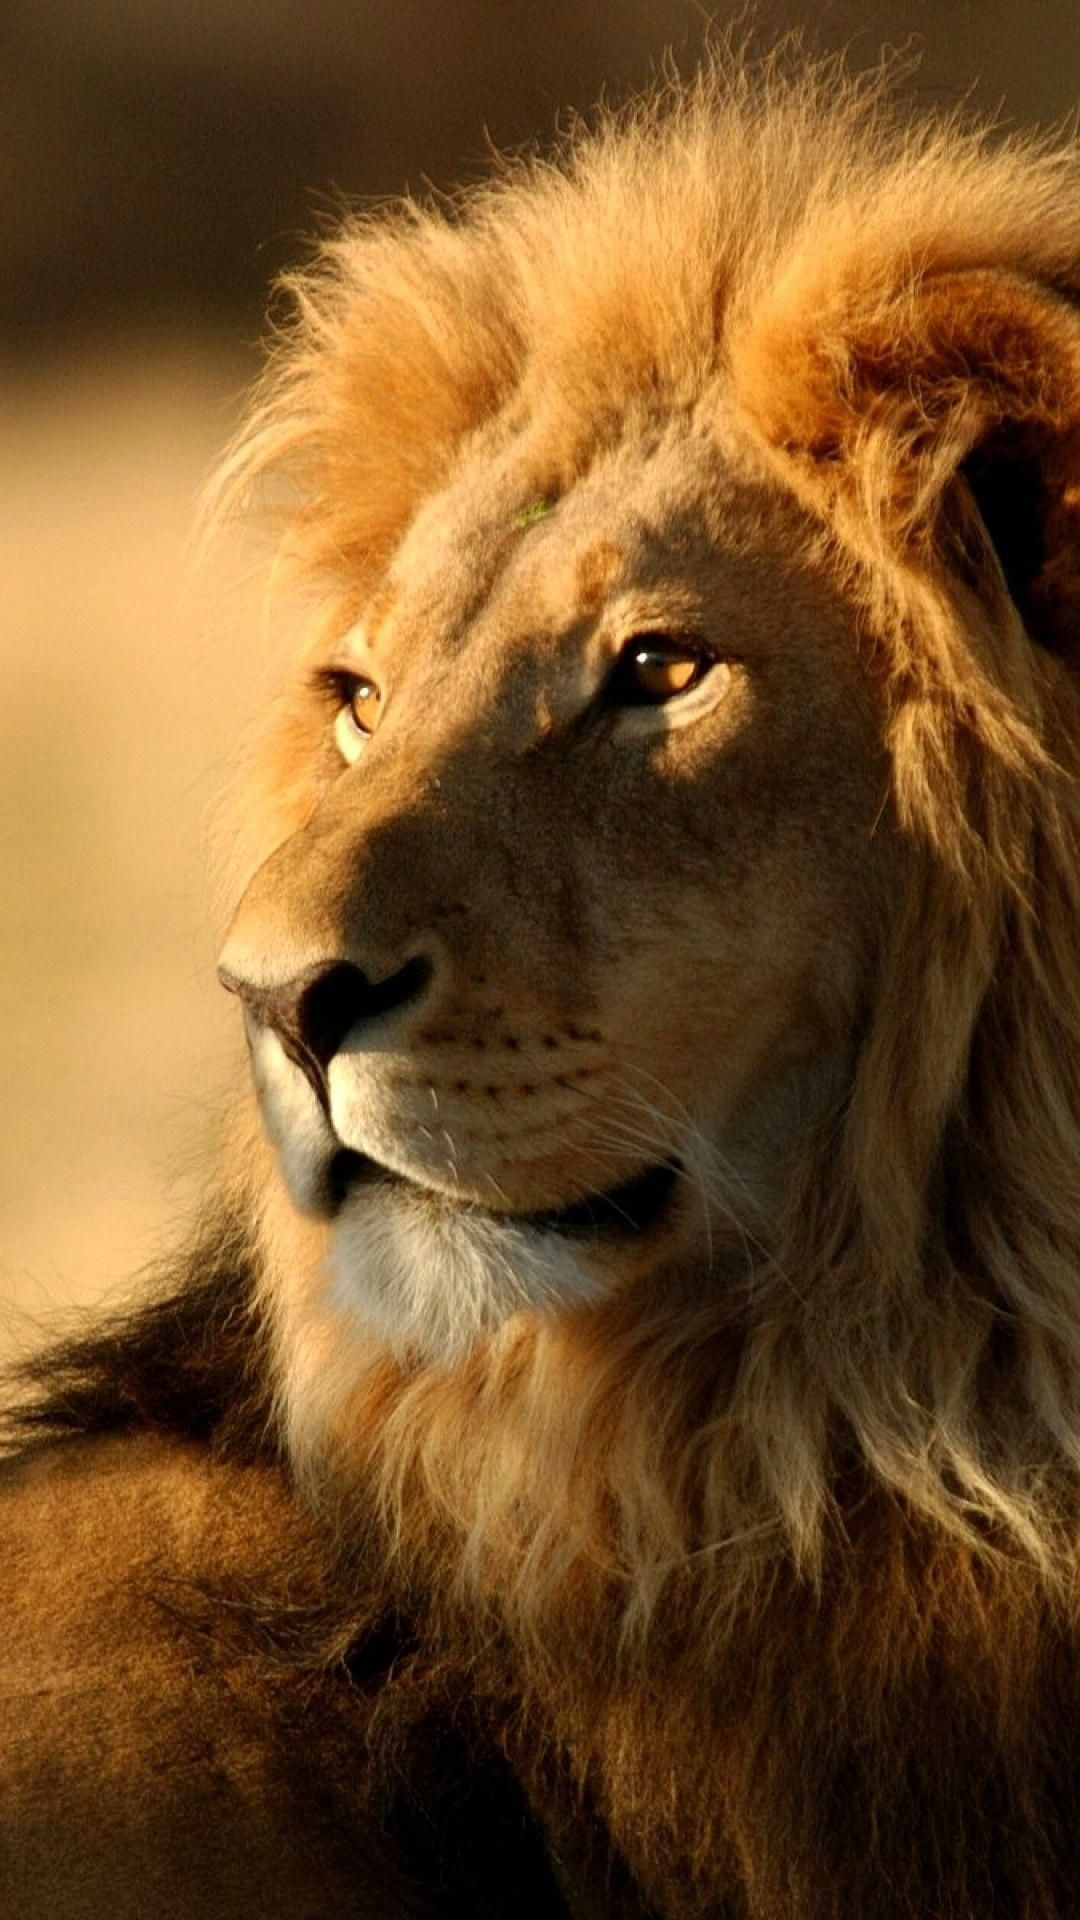 1080x1920 Lion Wallpaper Hd Animals Lion Iphone 6 Plus Wallpaper #bigcats